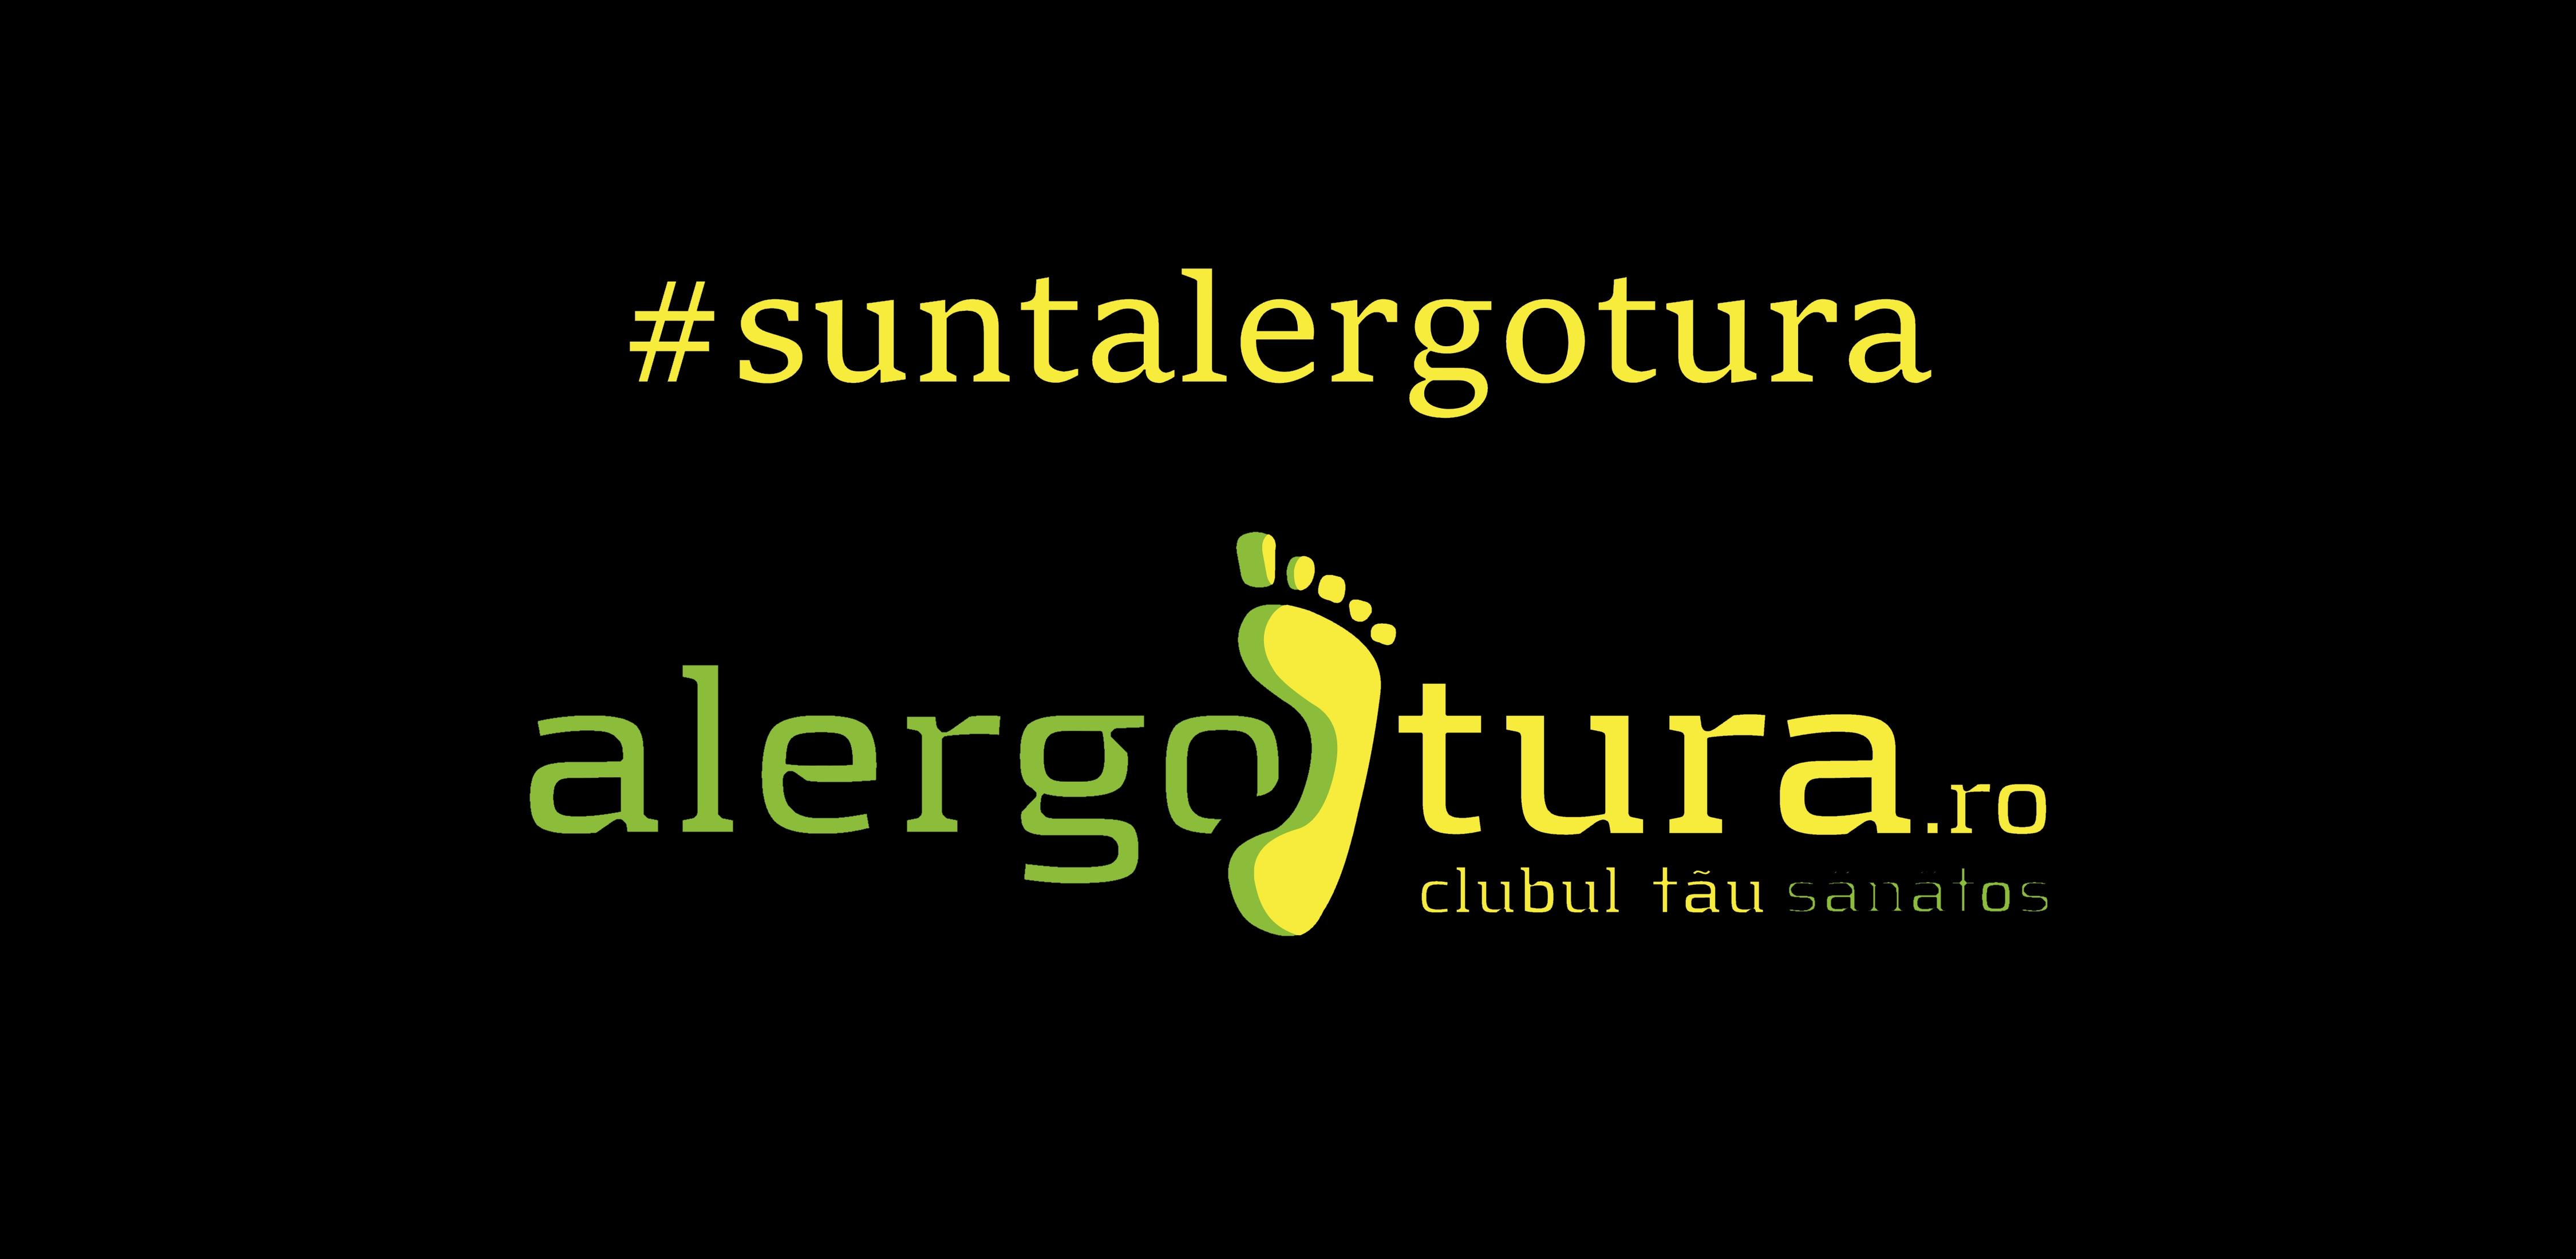 banner_suntalergotura